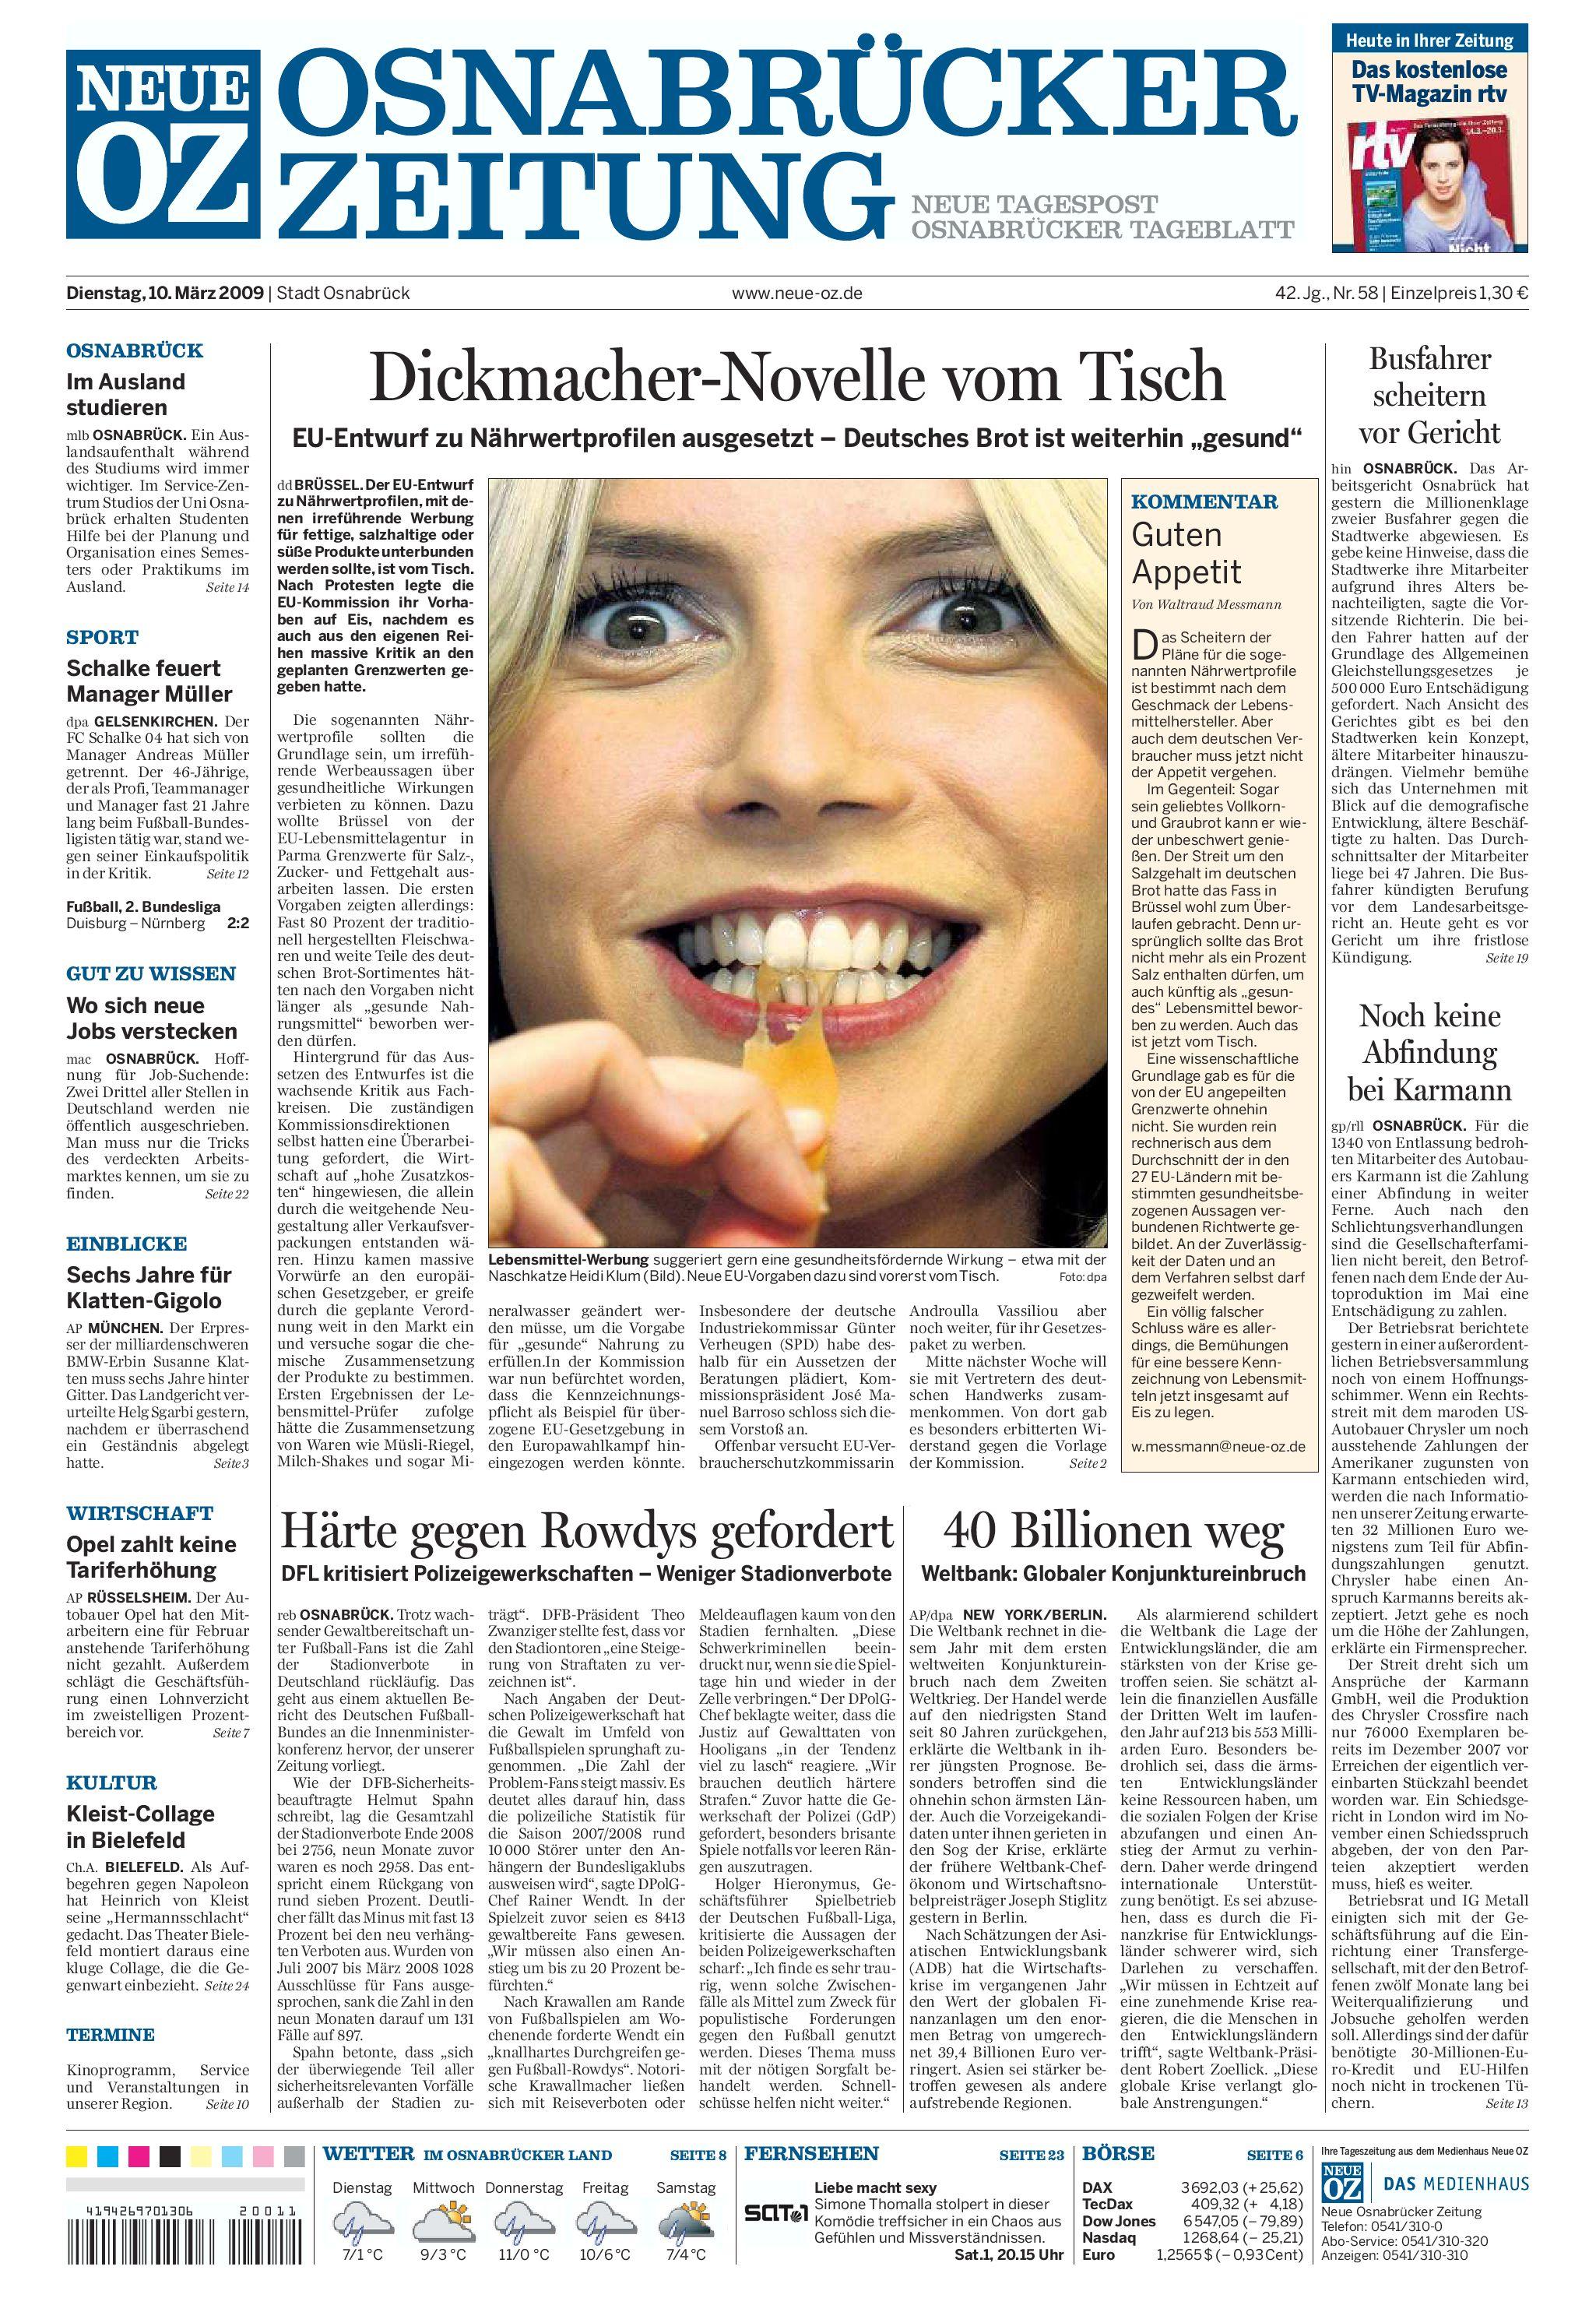 Neue Osnabrücker Zeitung by Alexander Pauly - issuu